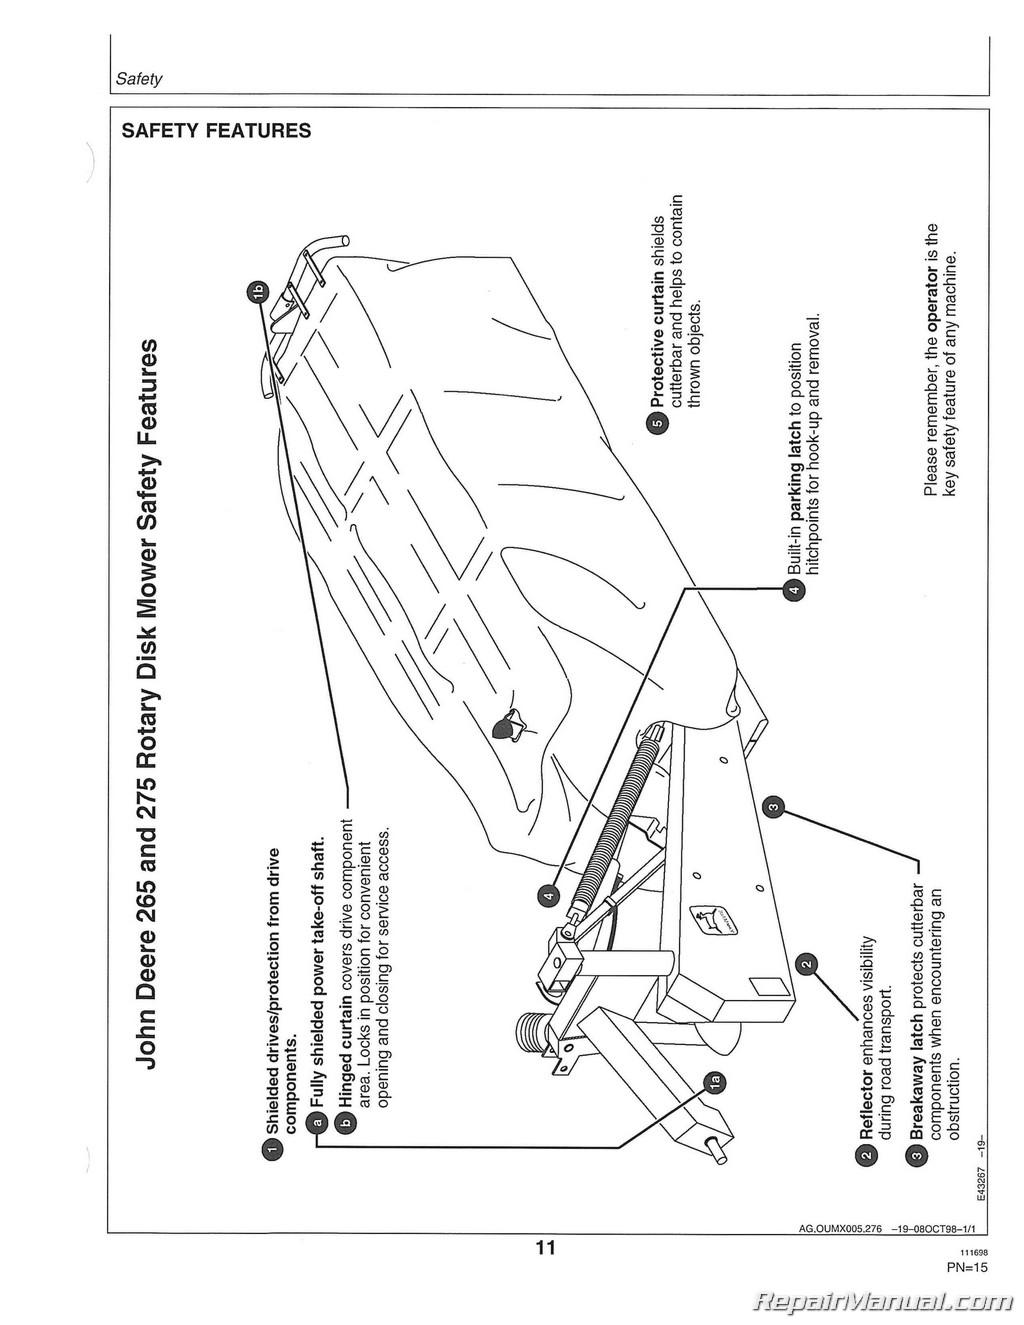 hight resolution of john deere 265 part diagram air filter